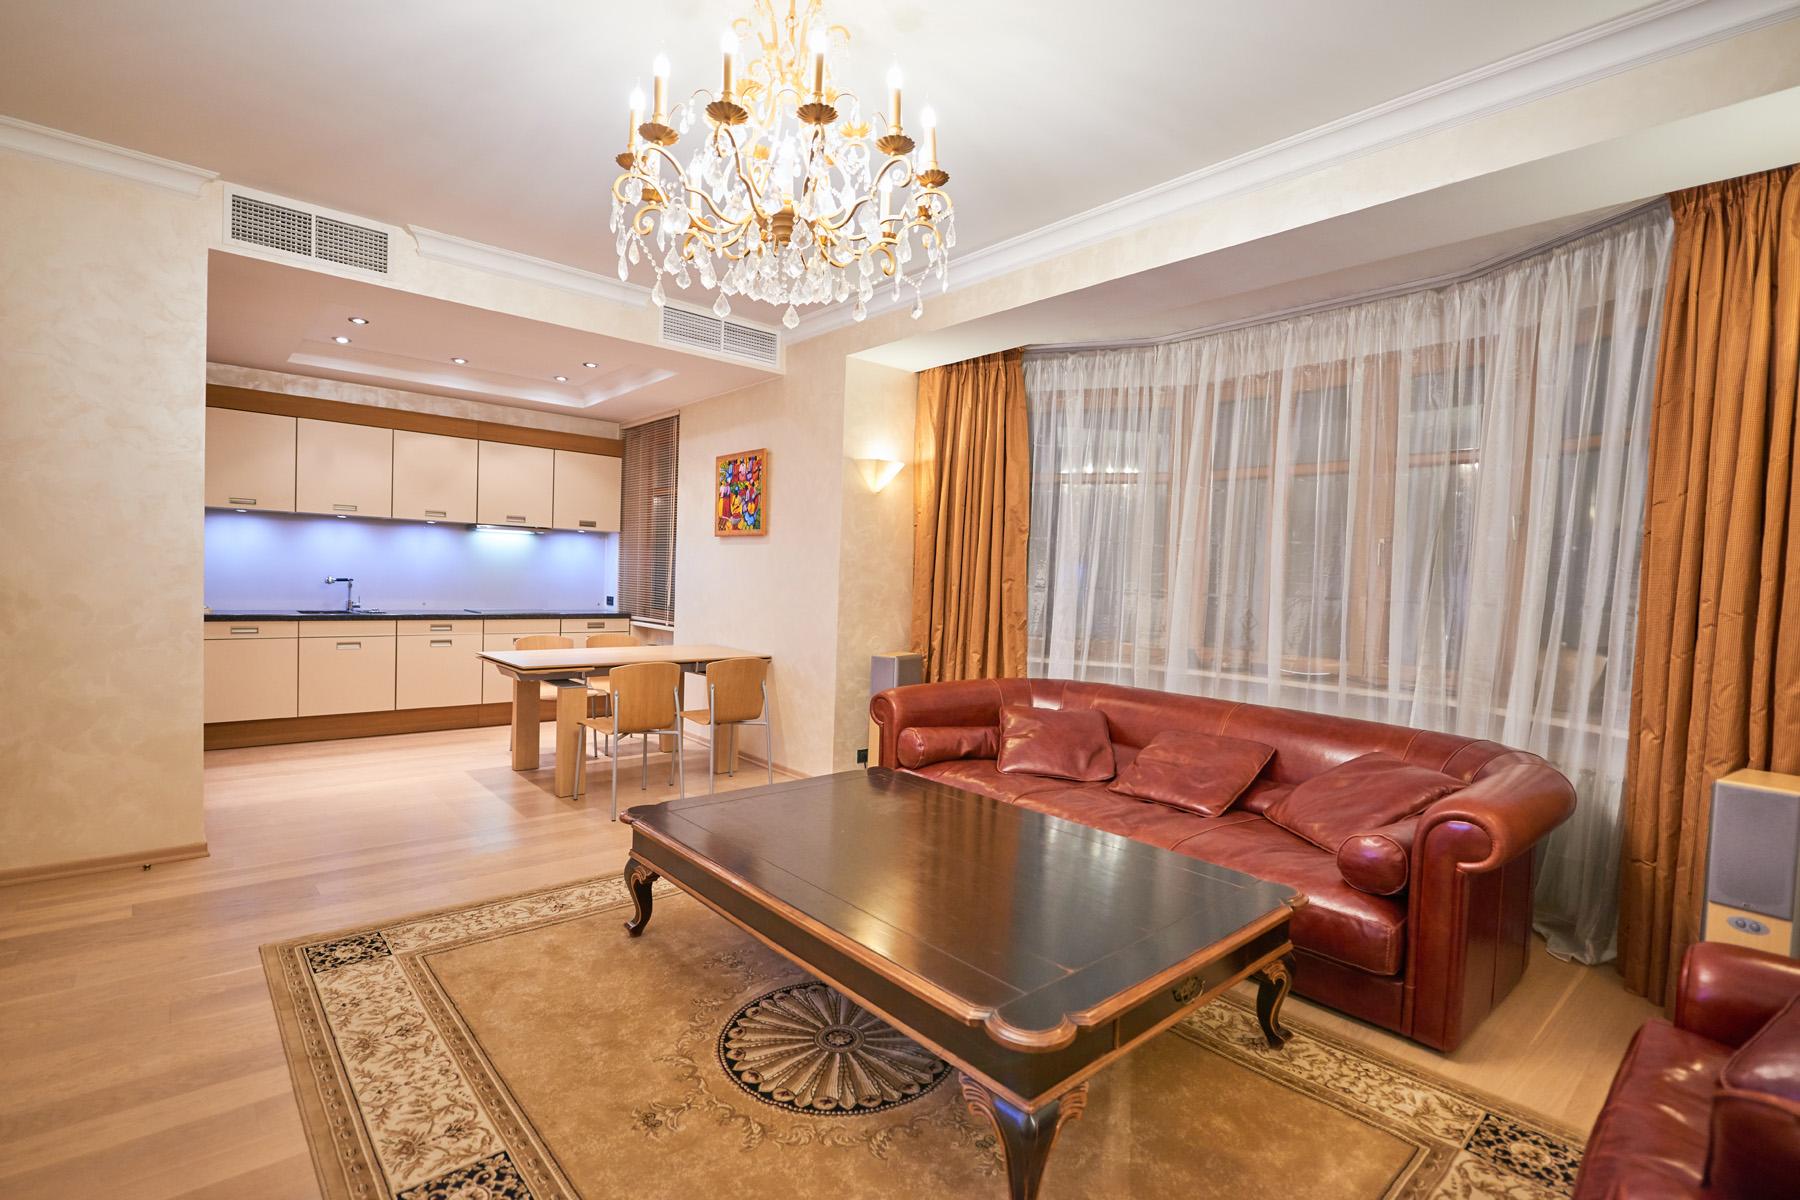 Apartments için Kiralama at Two-level penthouse 184 sq.m. in Tsvetnoy Moscow, Moskova Rusya